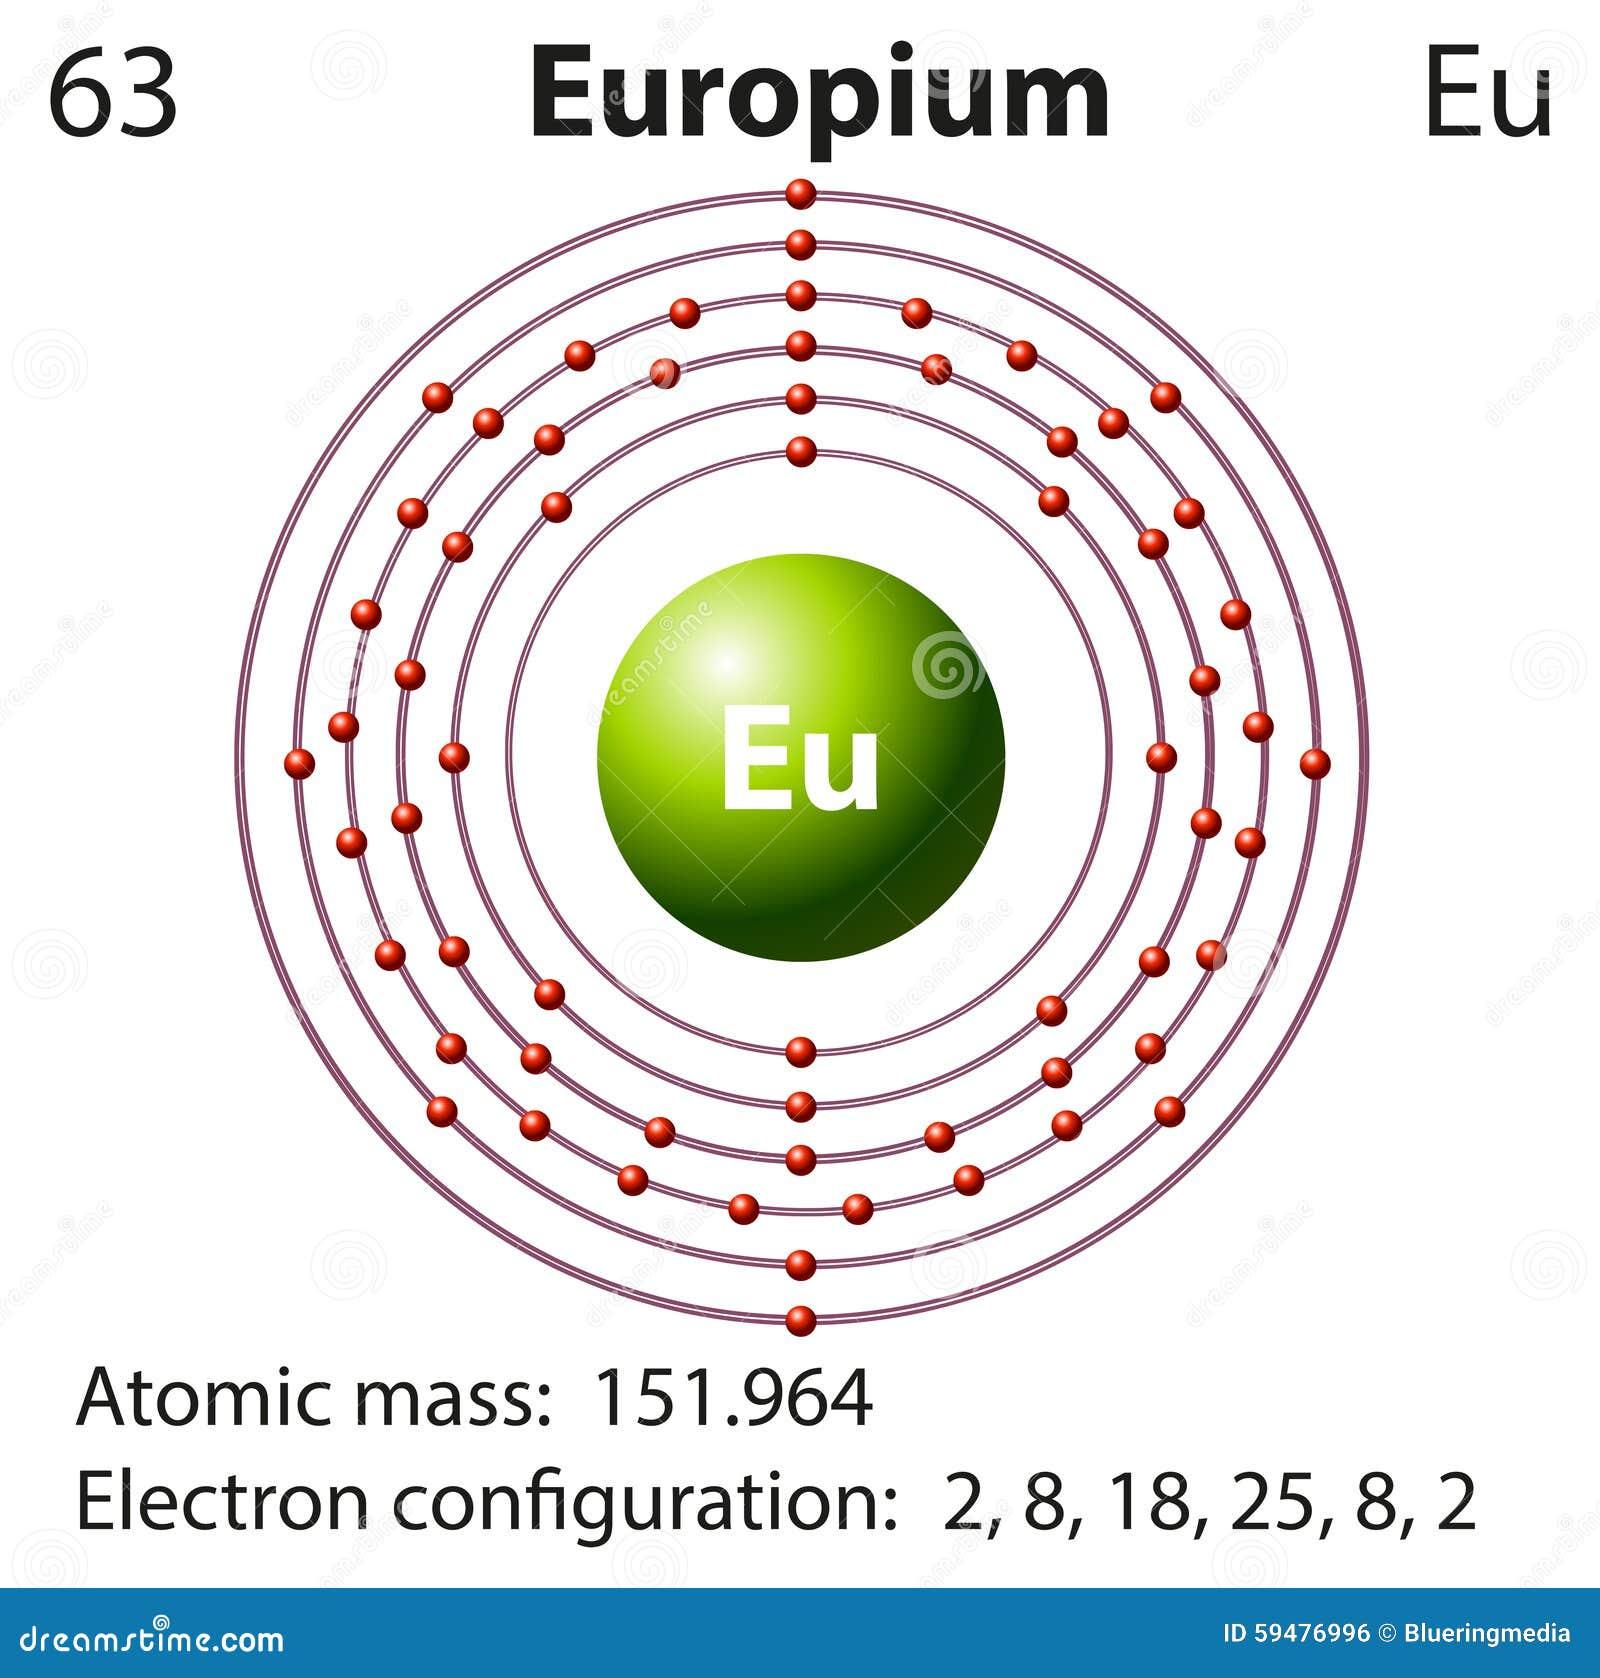 Symbolu i elektronu diagram dla europu